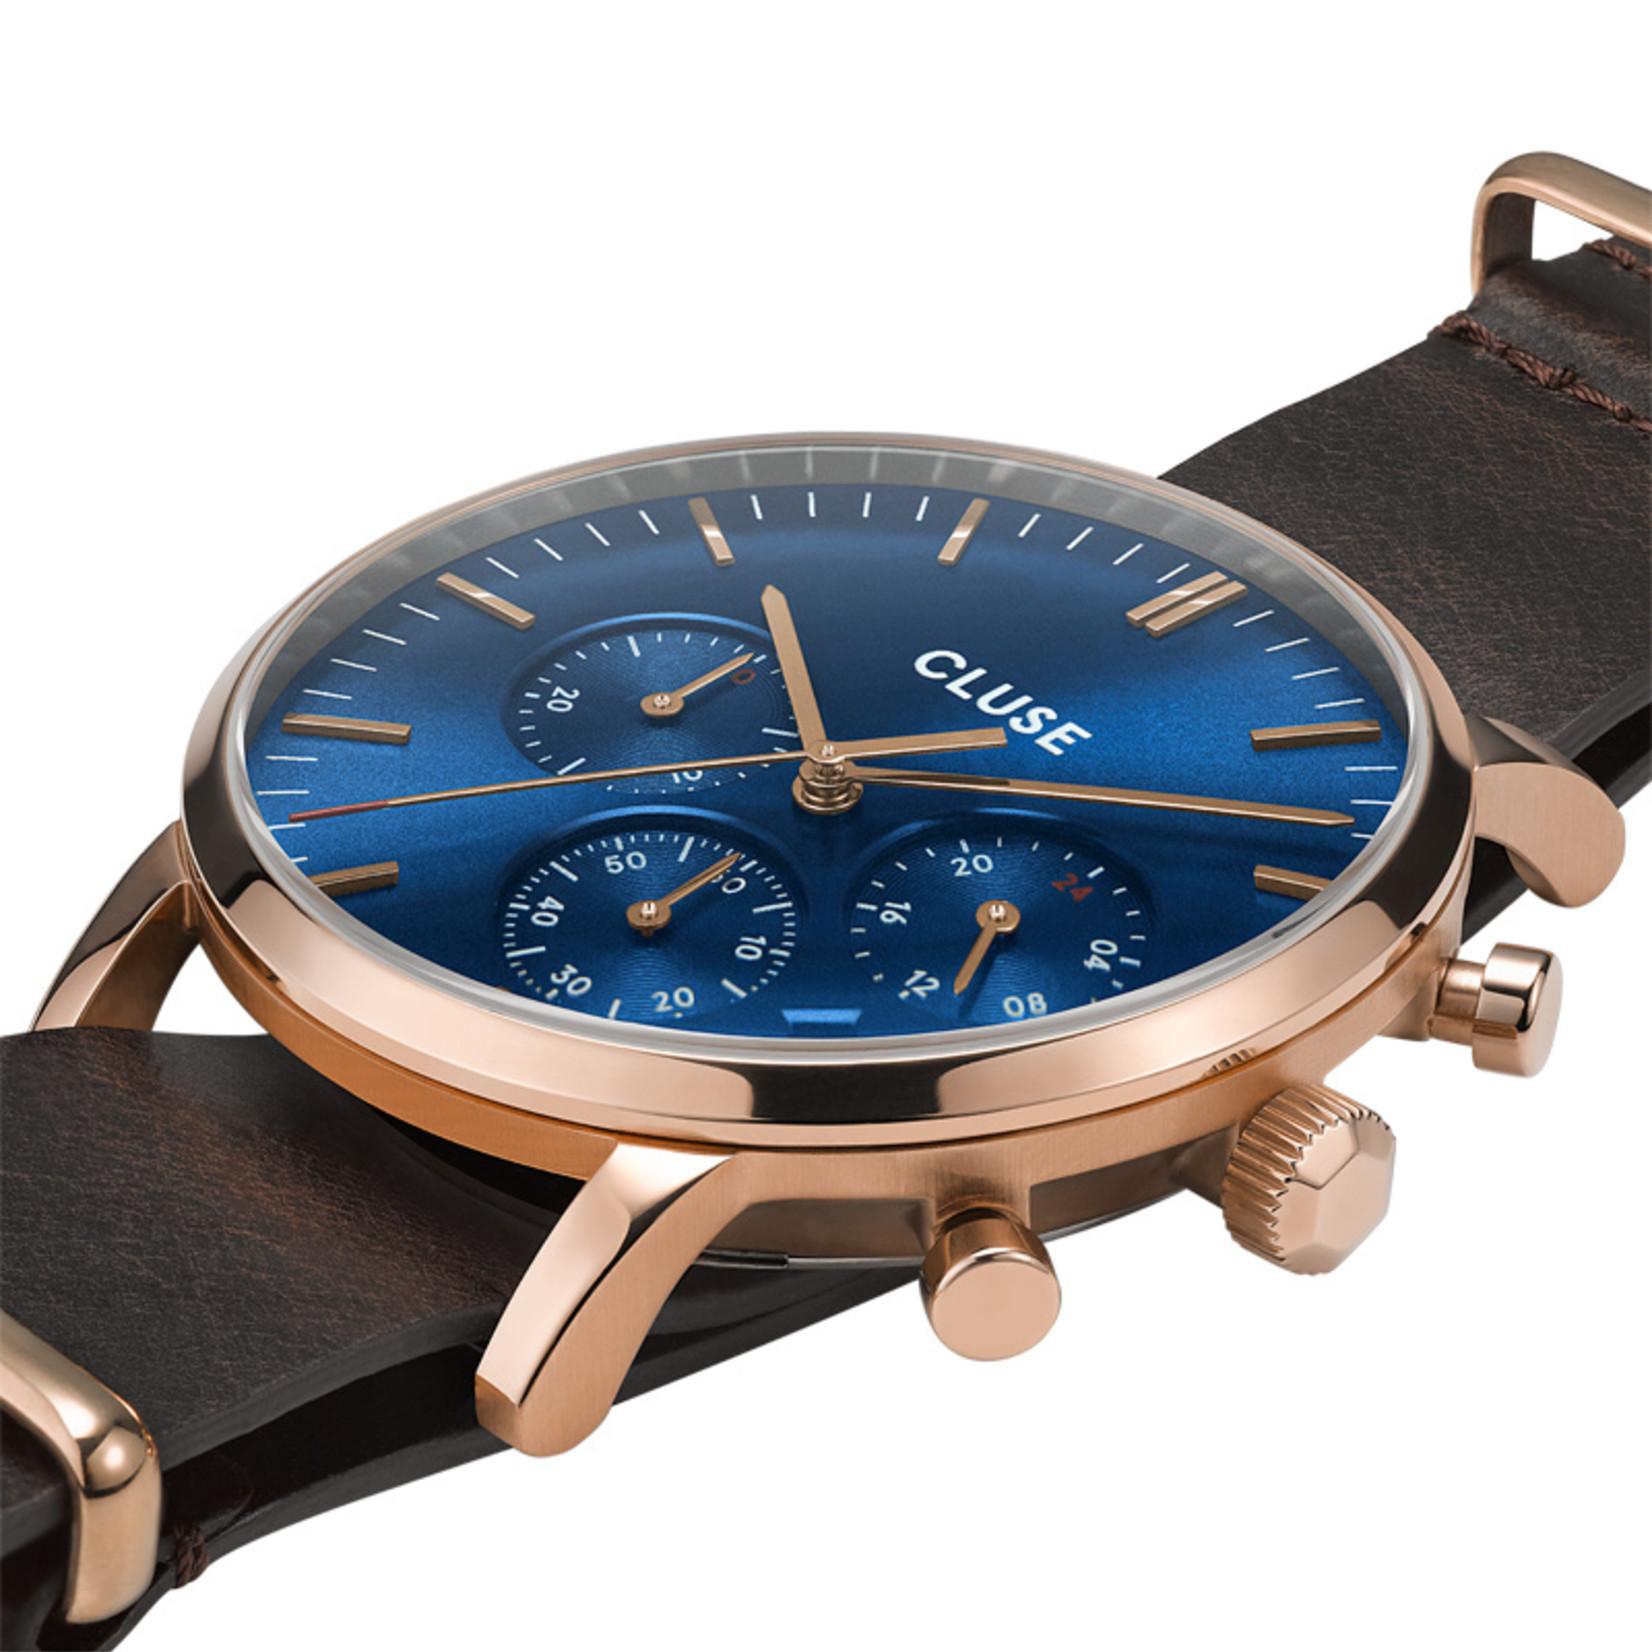 Cluse Cluse Uhr Aravis dunkelbraun-blau I Chronograph I NATO Leder